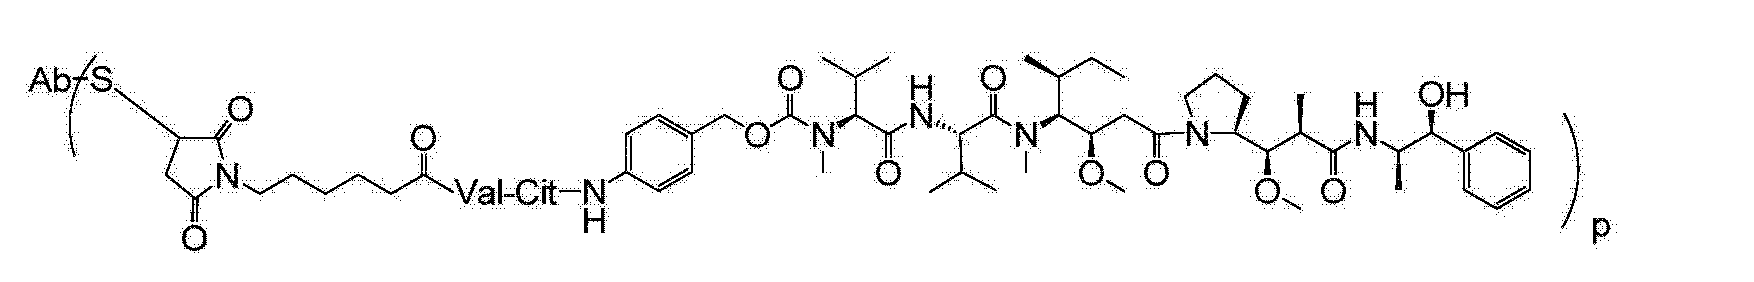 Figure CN104411721AD00153